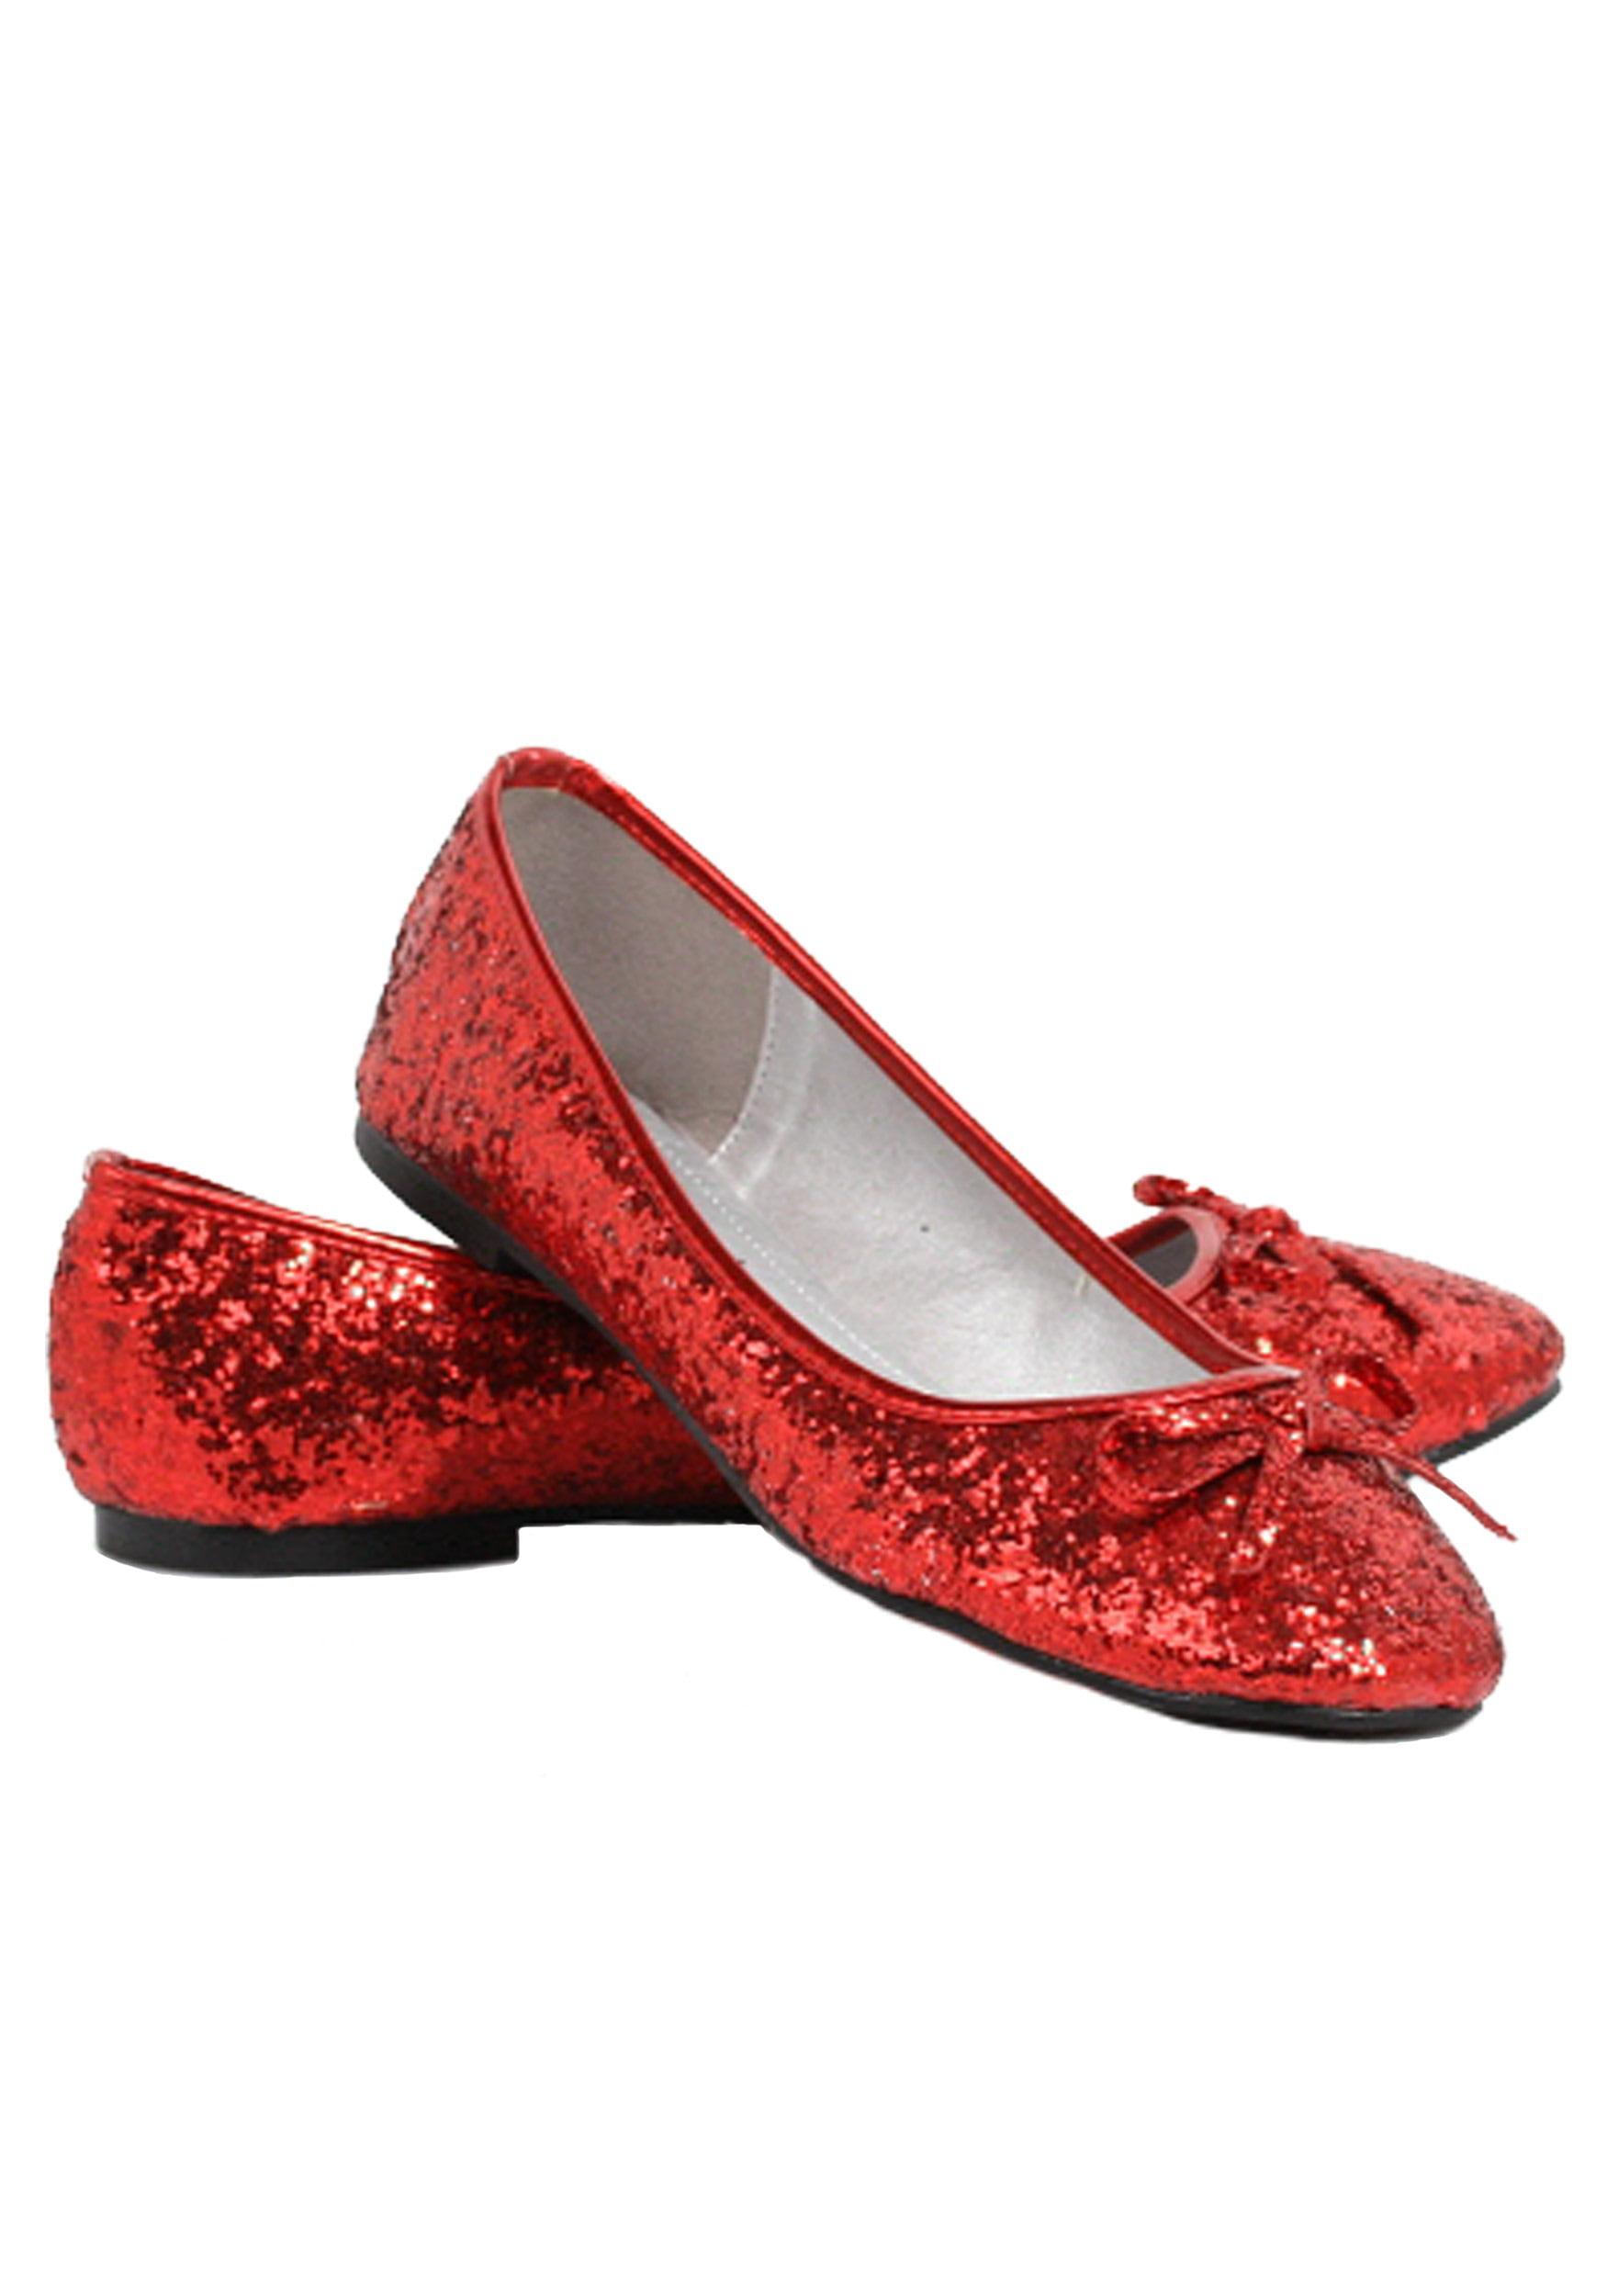 Red Glitter Star Flat Shoes - Walmart